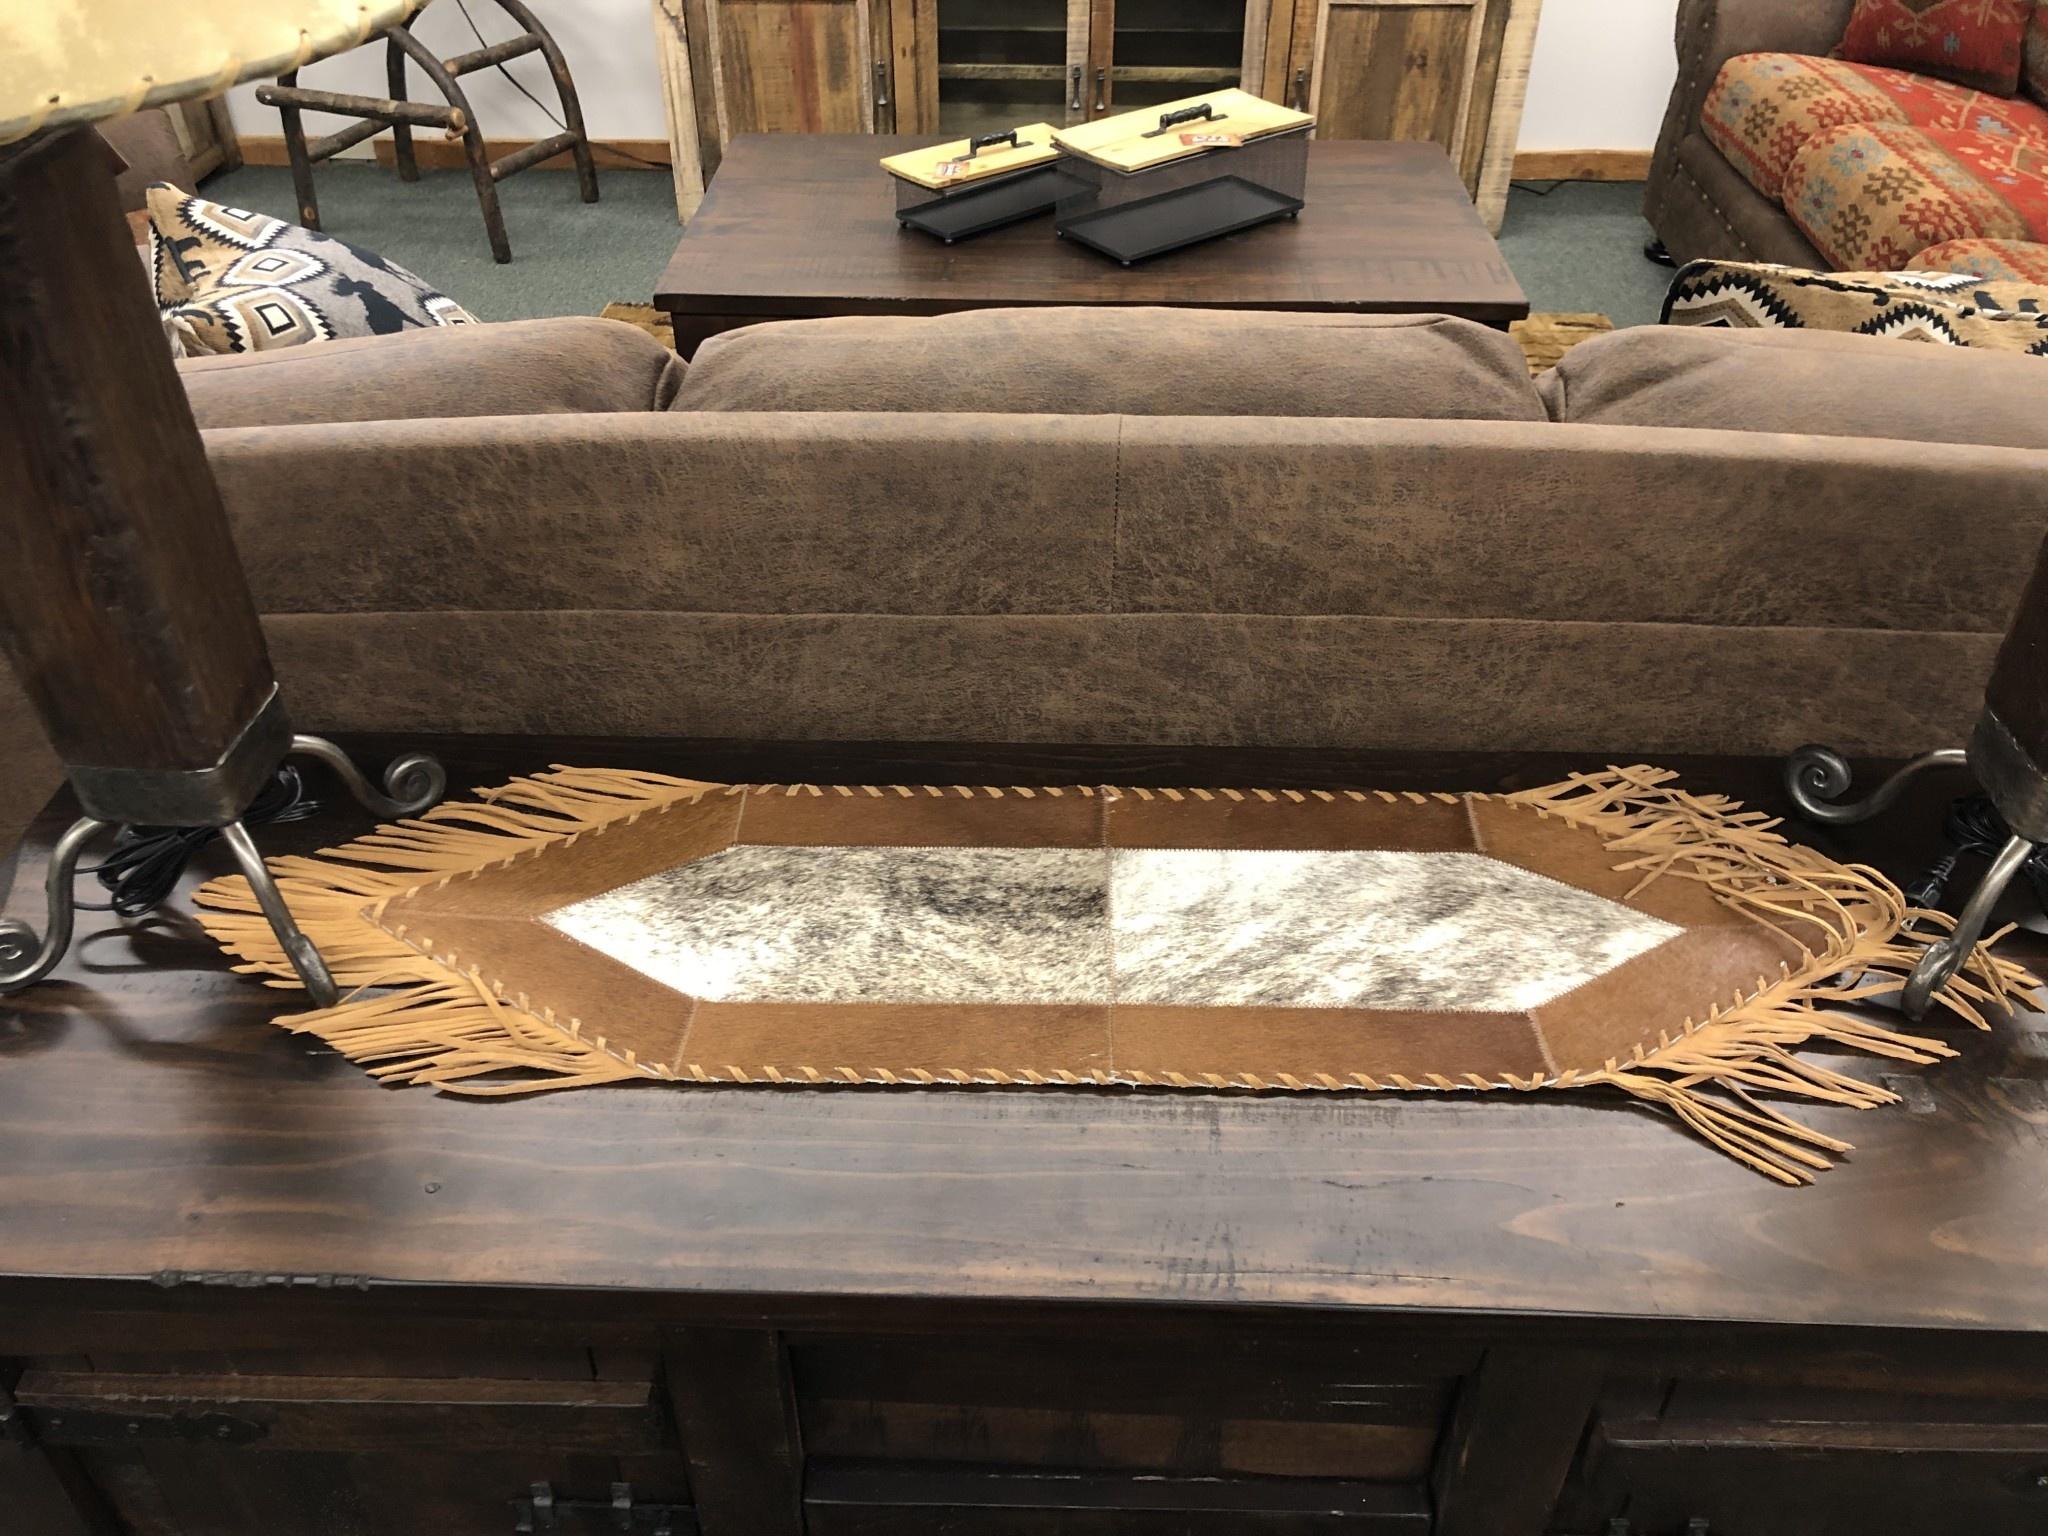 Gaucho Small Cowhide Table Runner Big Bear Furniture